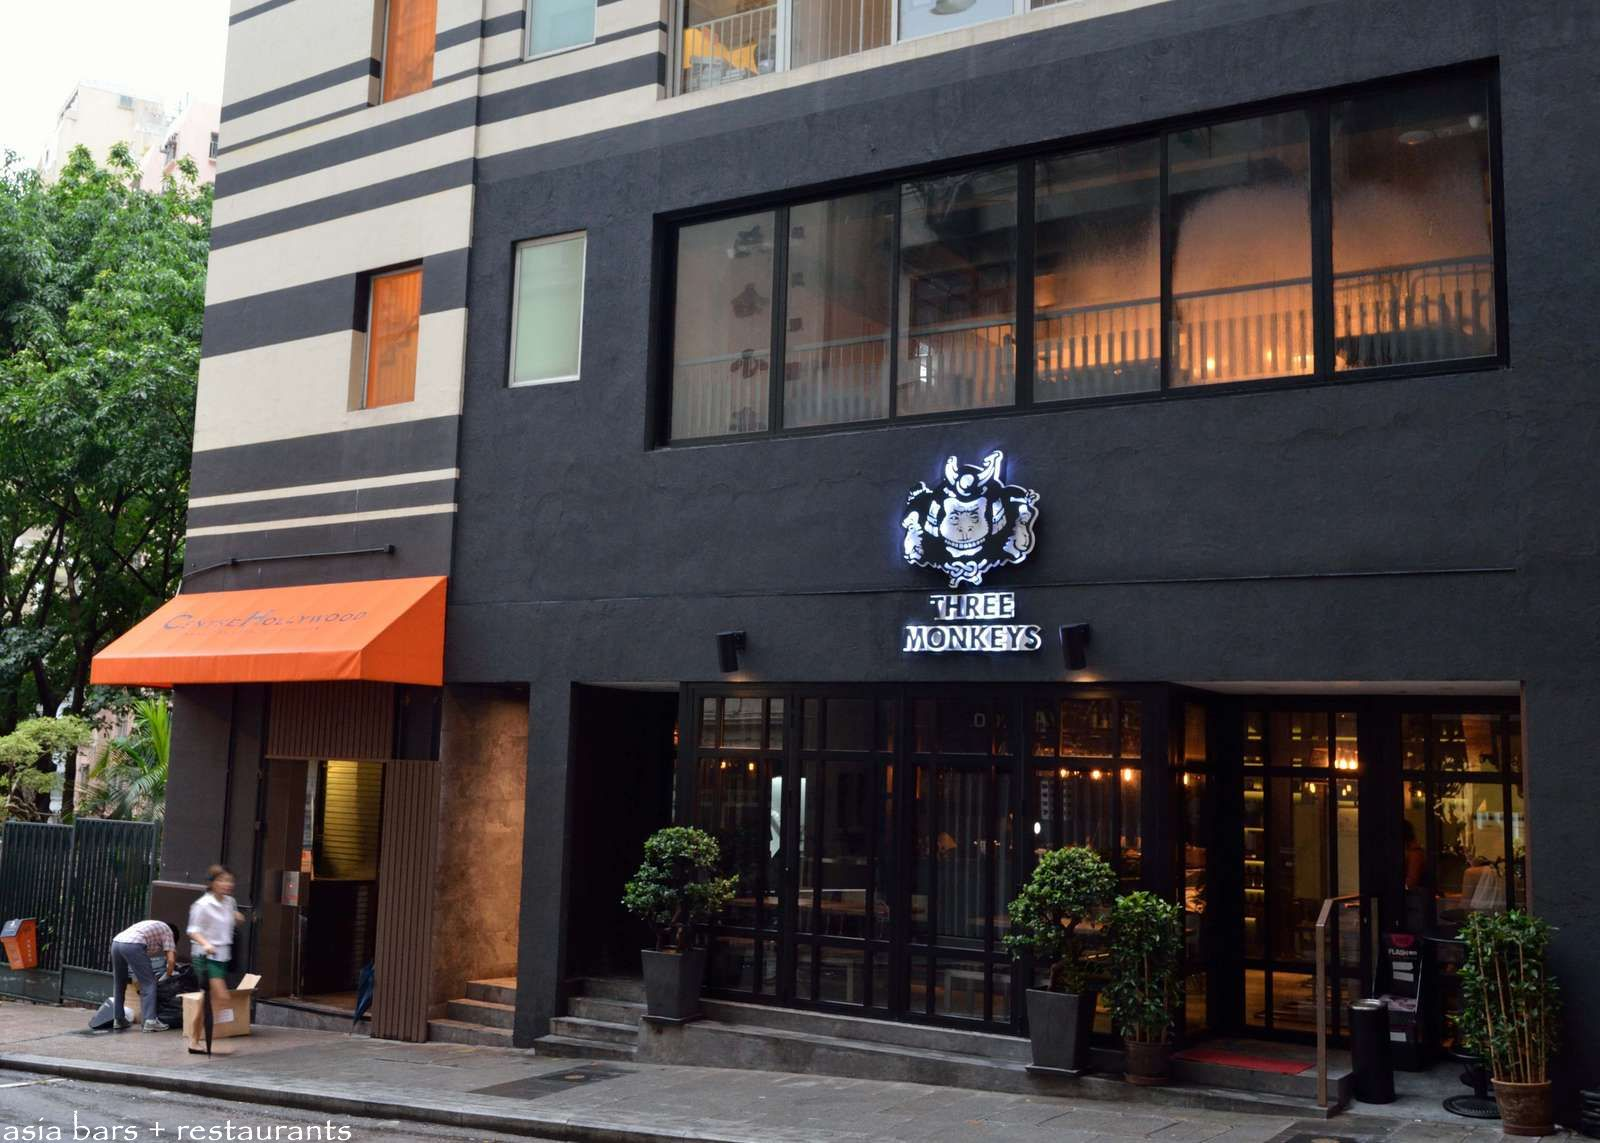 three monkeys a modern izakaya restaurant bar in hong kong asia bars restaurants. Black Bedroom Furniture Sets. Home Design Ideas